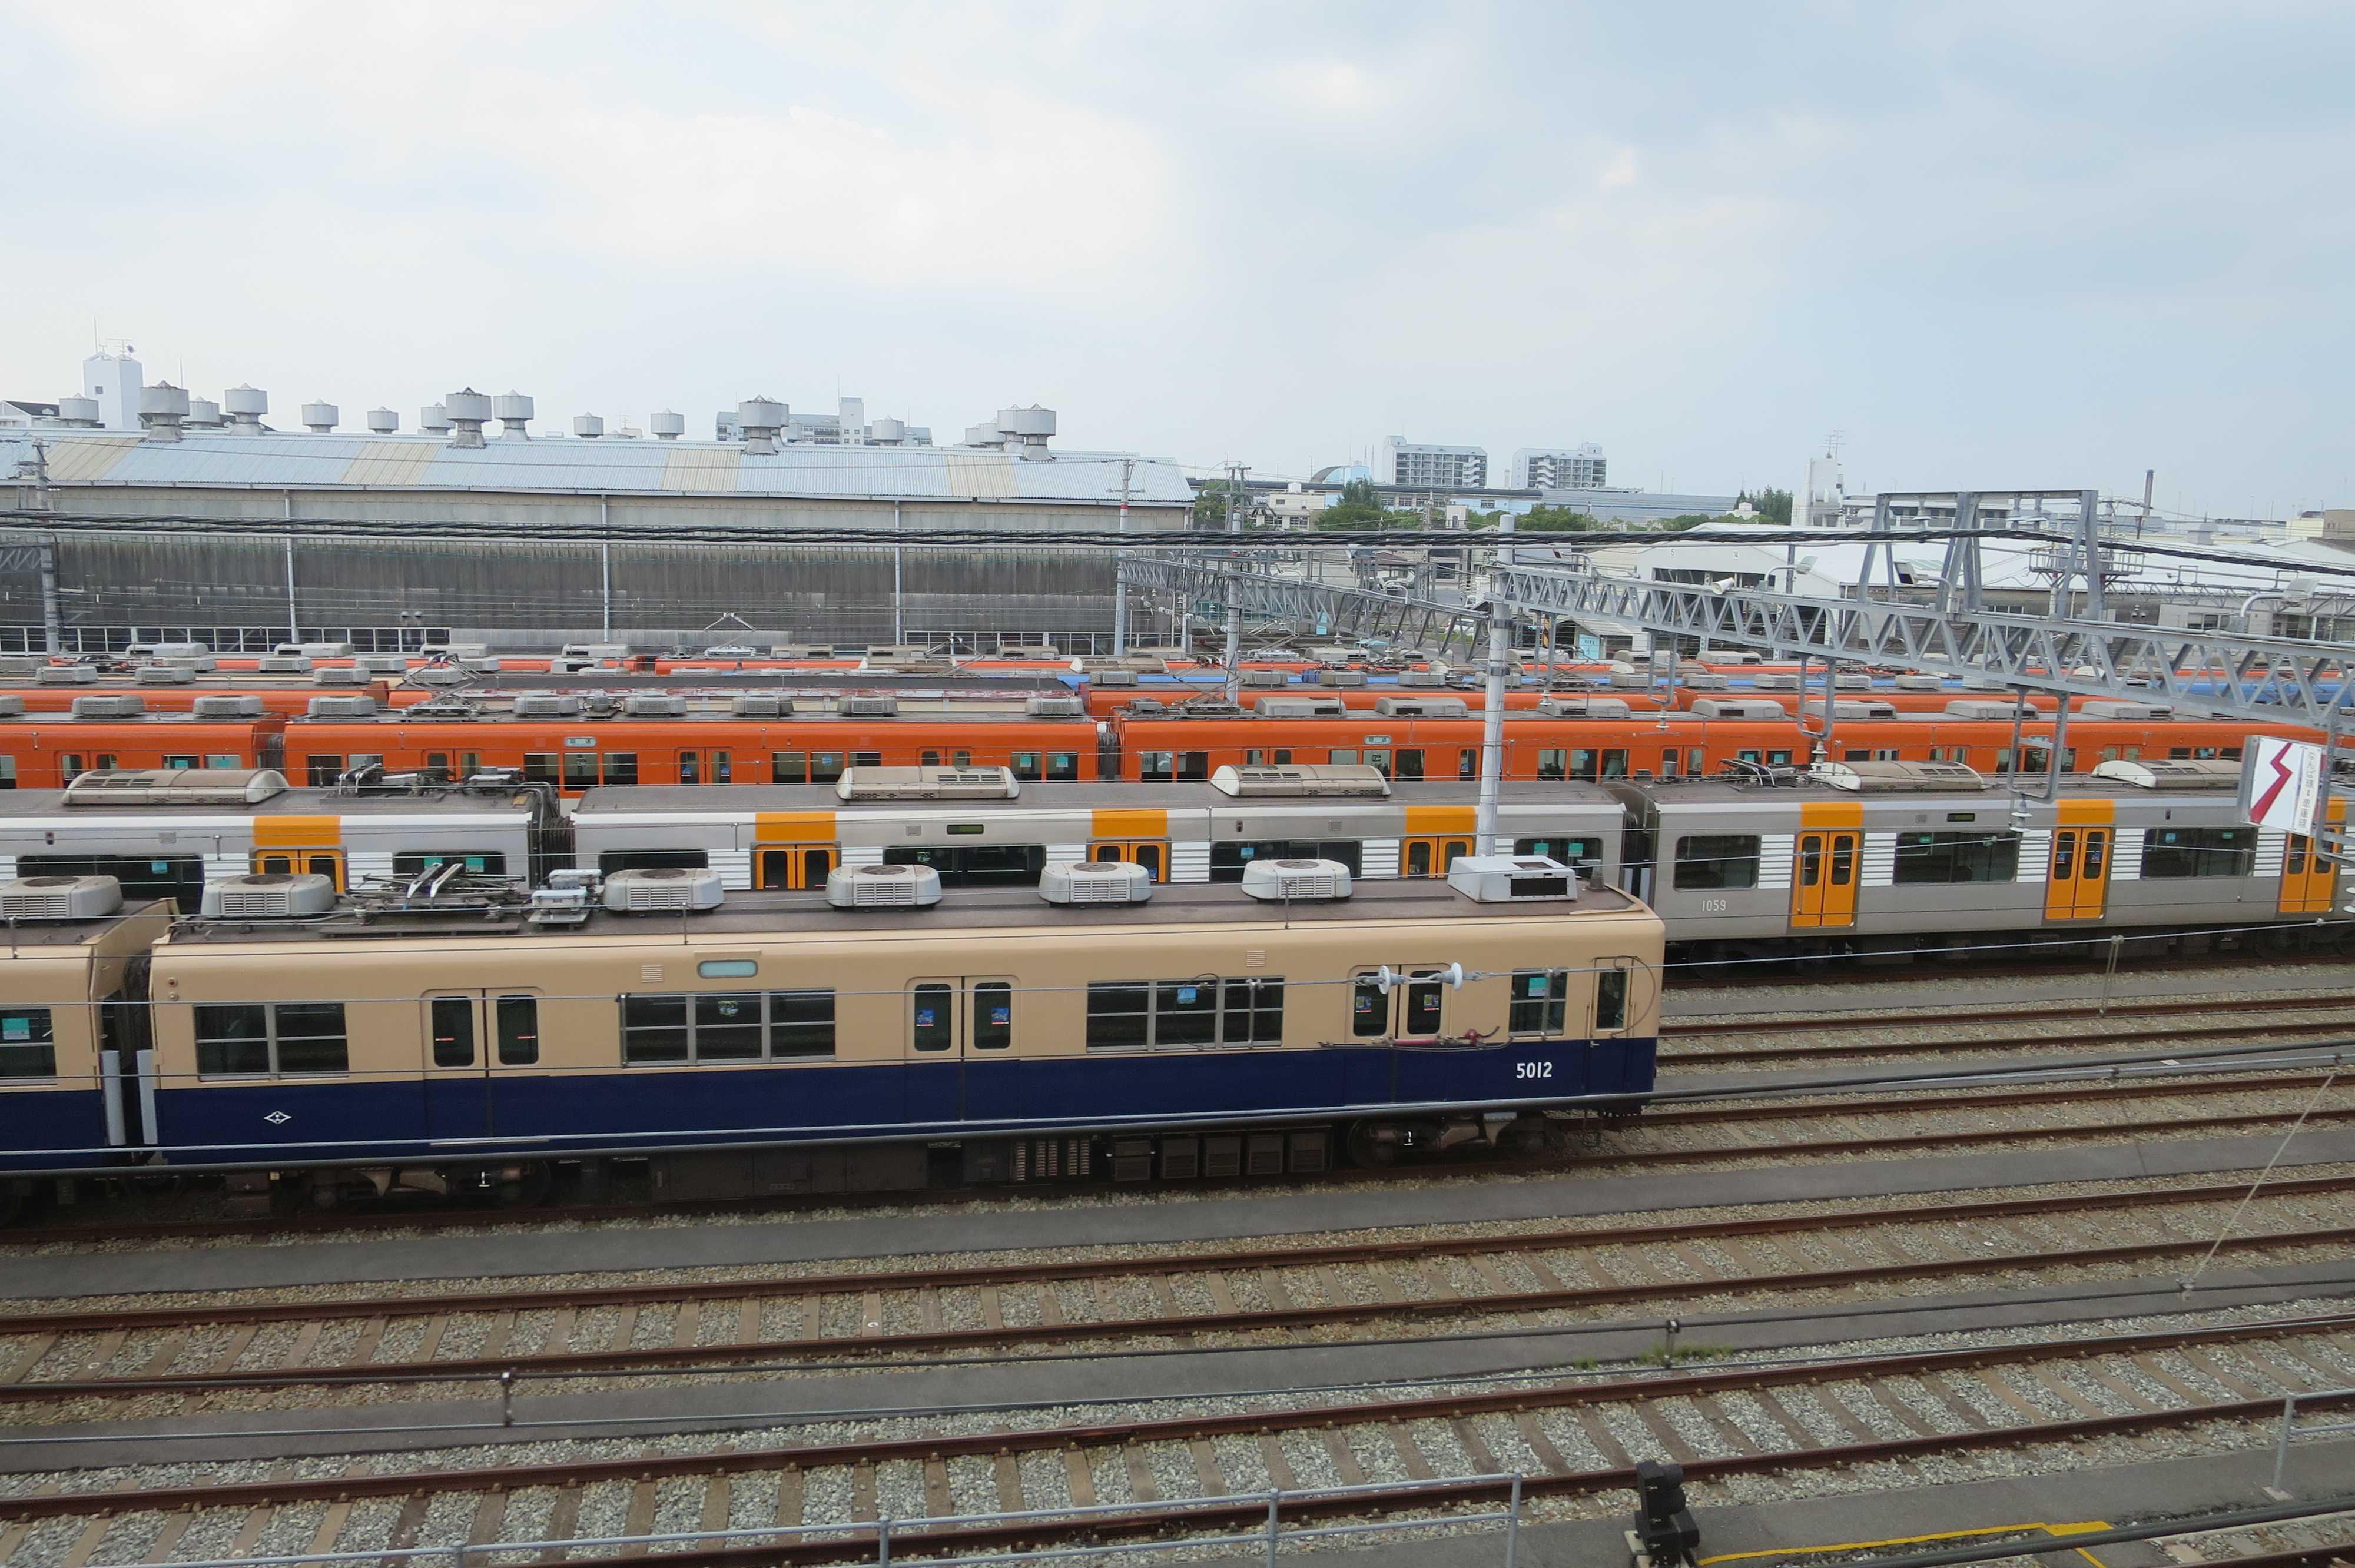 阪神電鉄の尼崎車庫